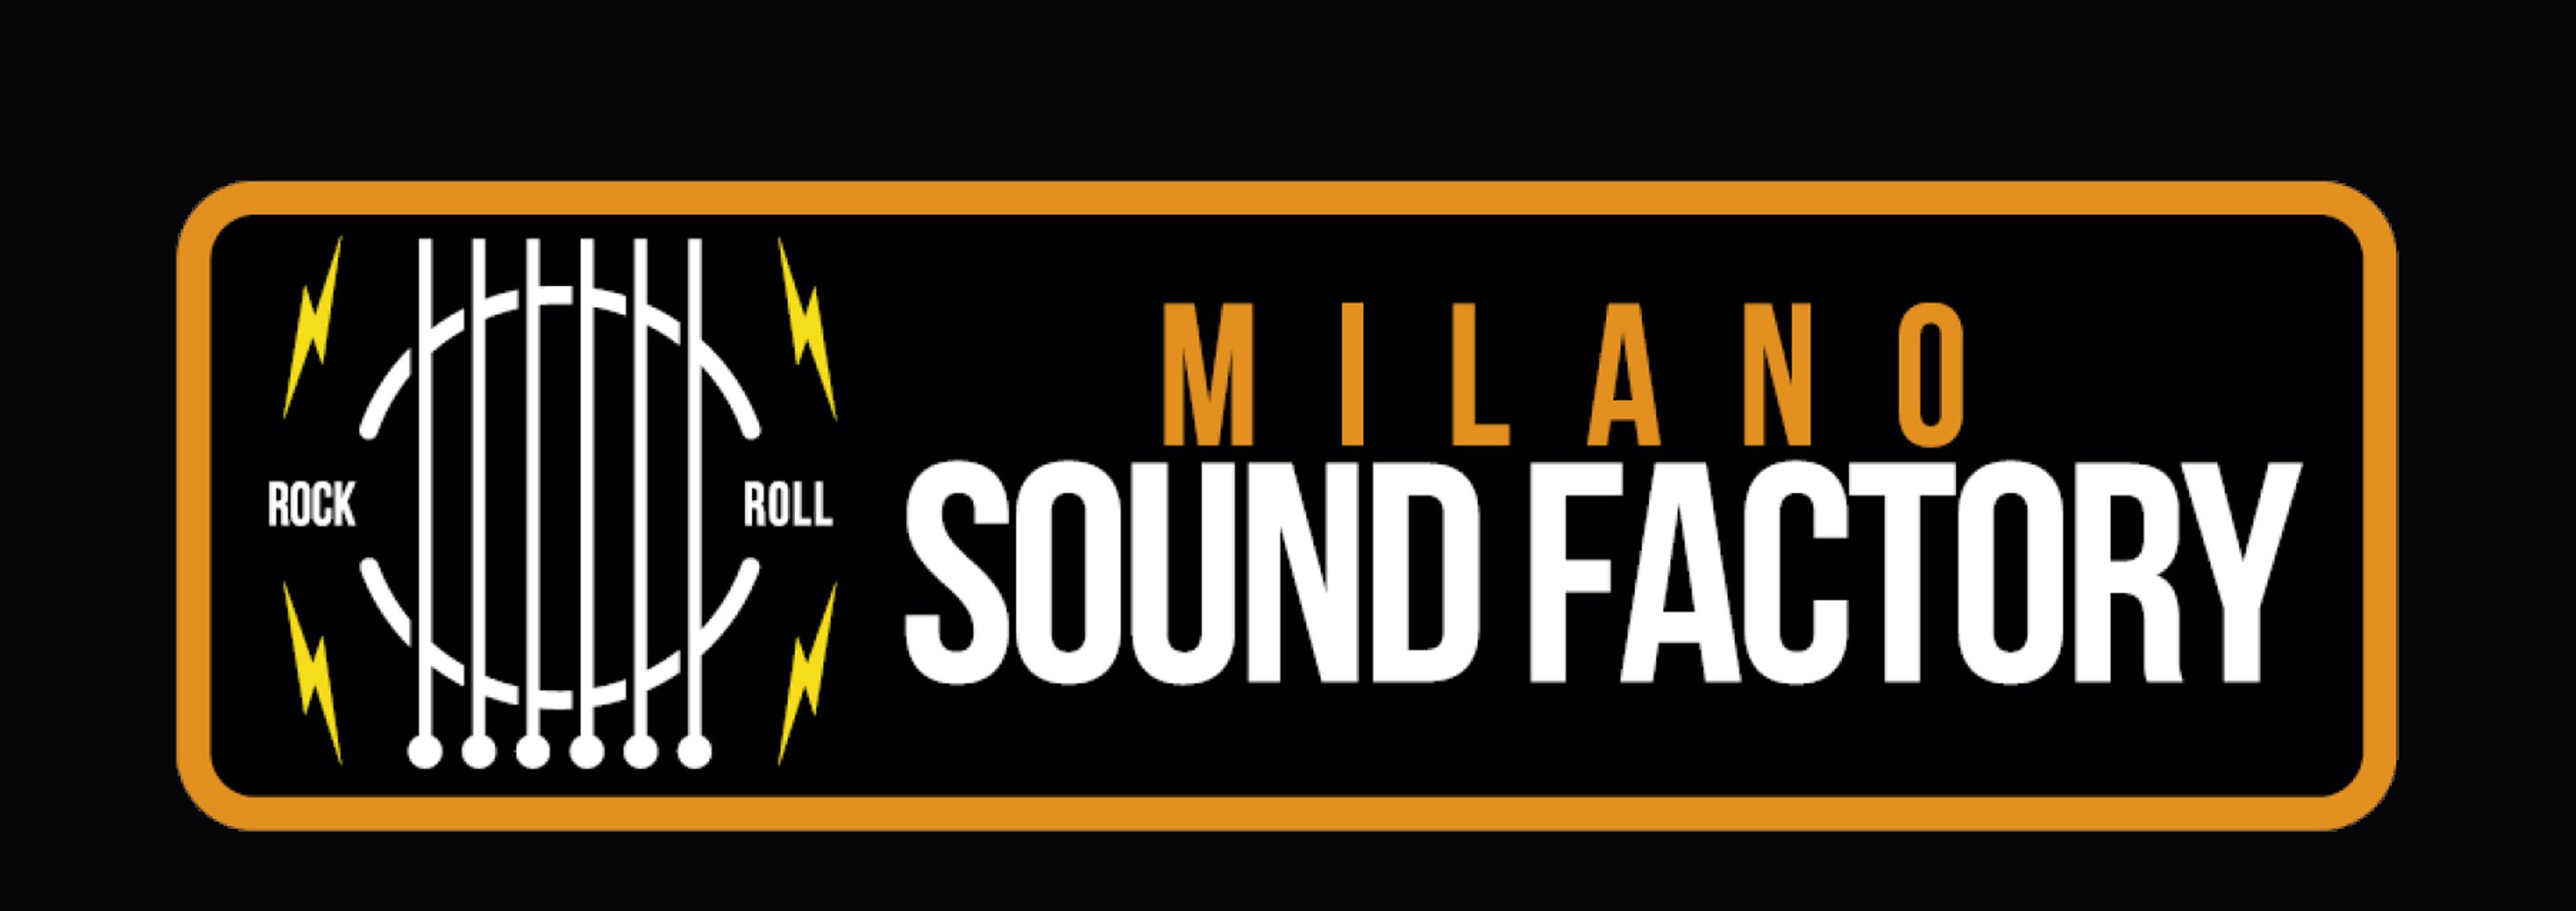 Milano Sound Factory